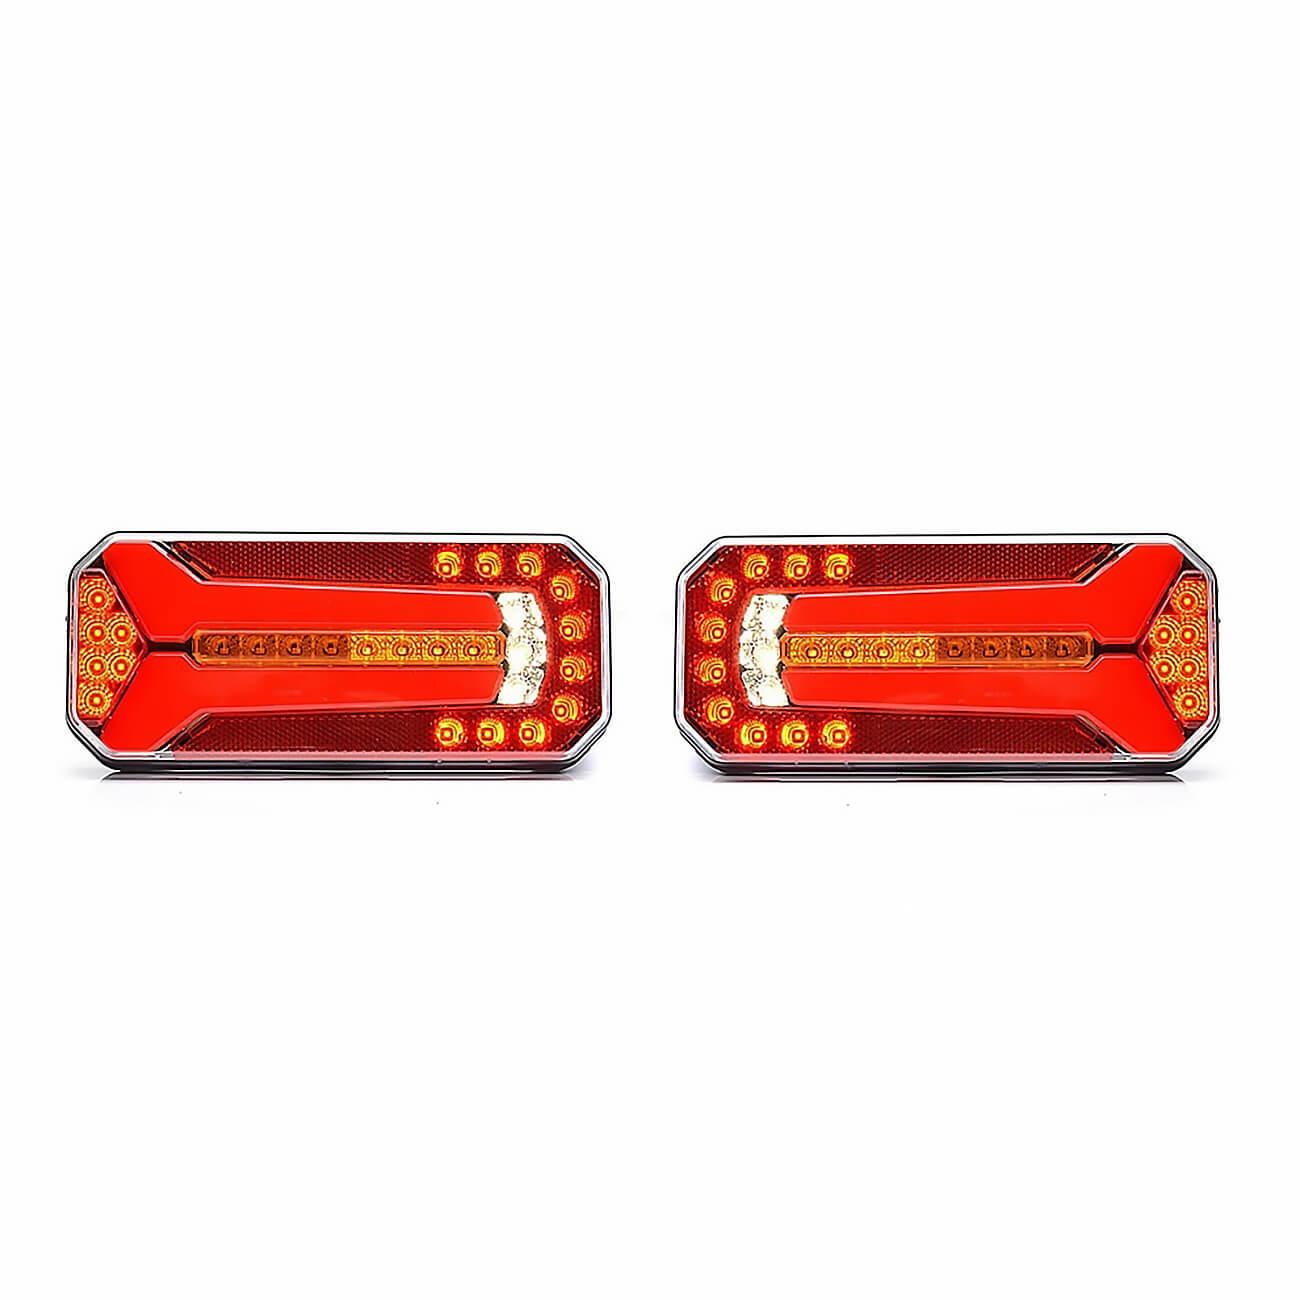 LED Neon Е-Мark Φανός Οπίσθιος 12V 24V Φρένων – Tρεχούμενο φλας – Όπισθεν – Πορείας